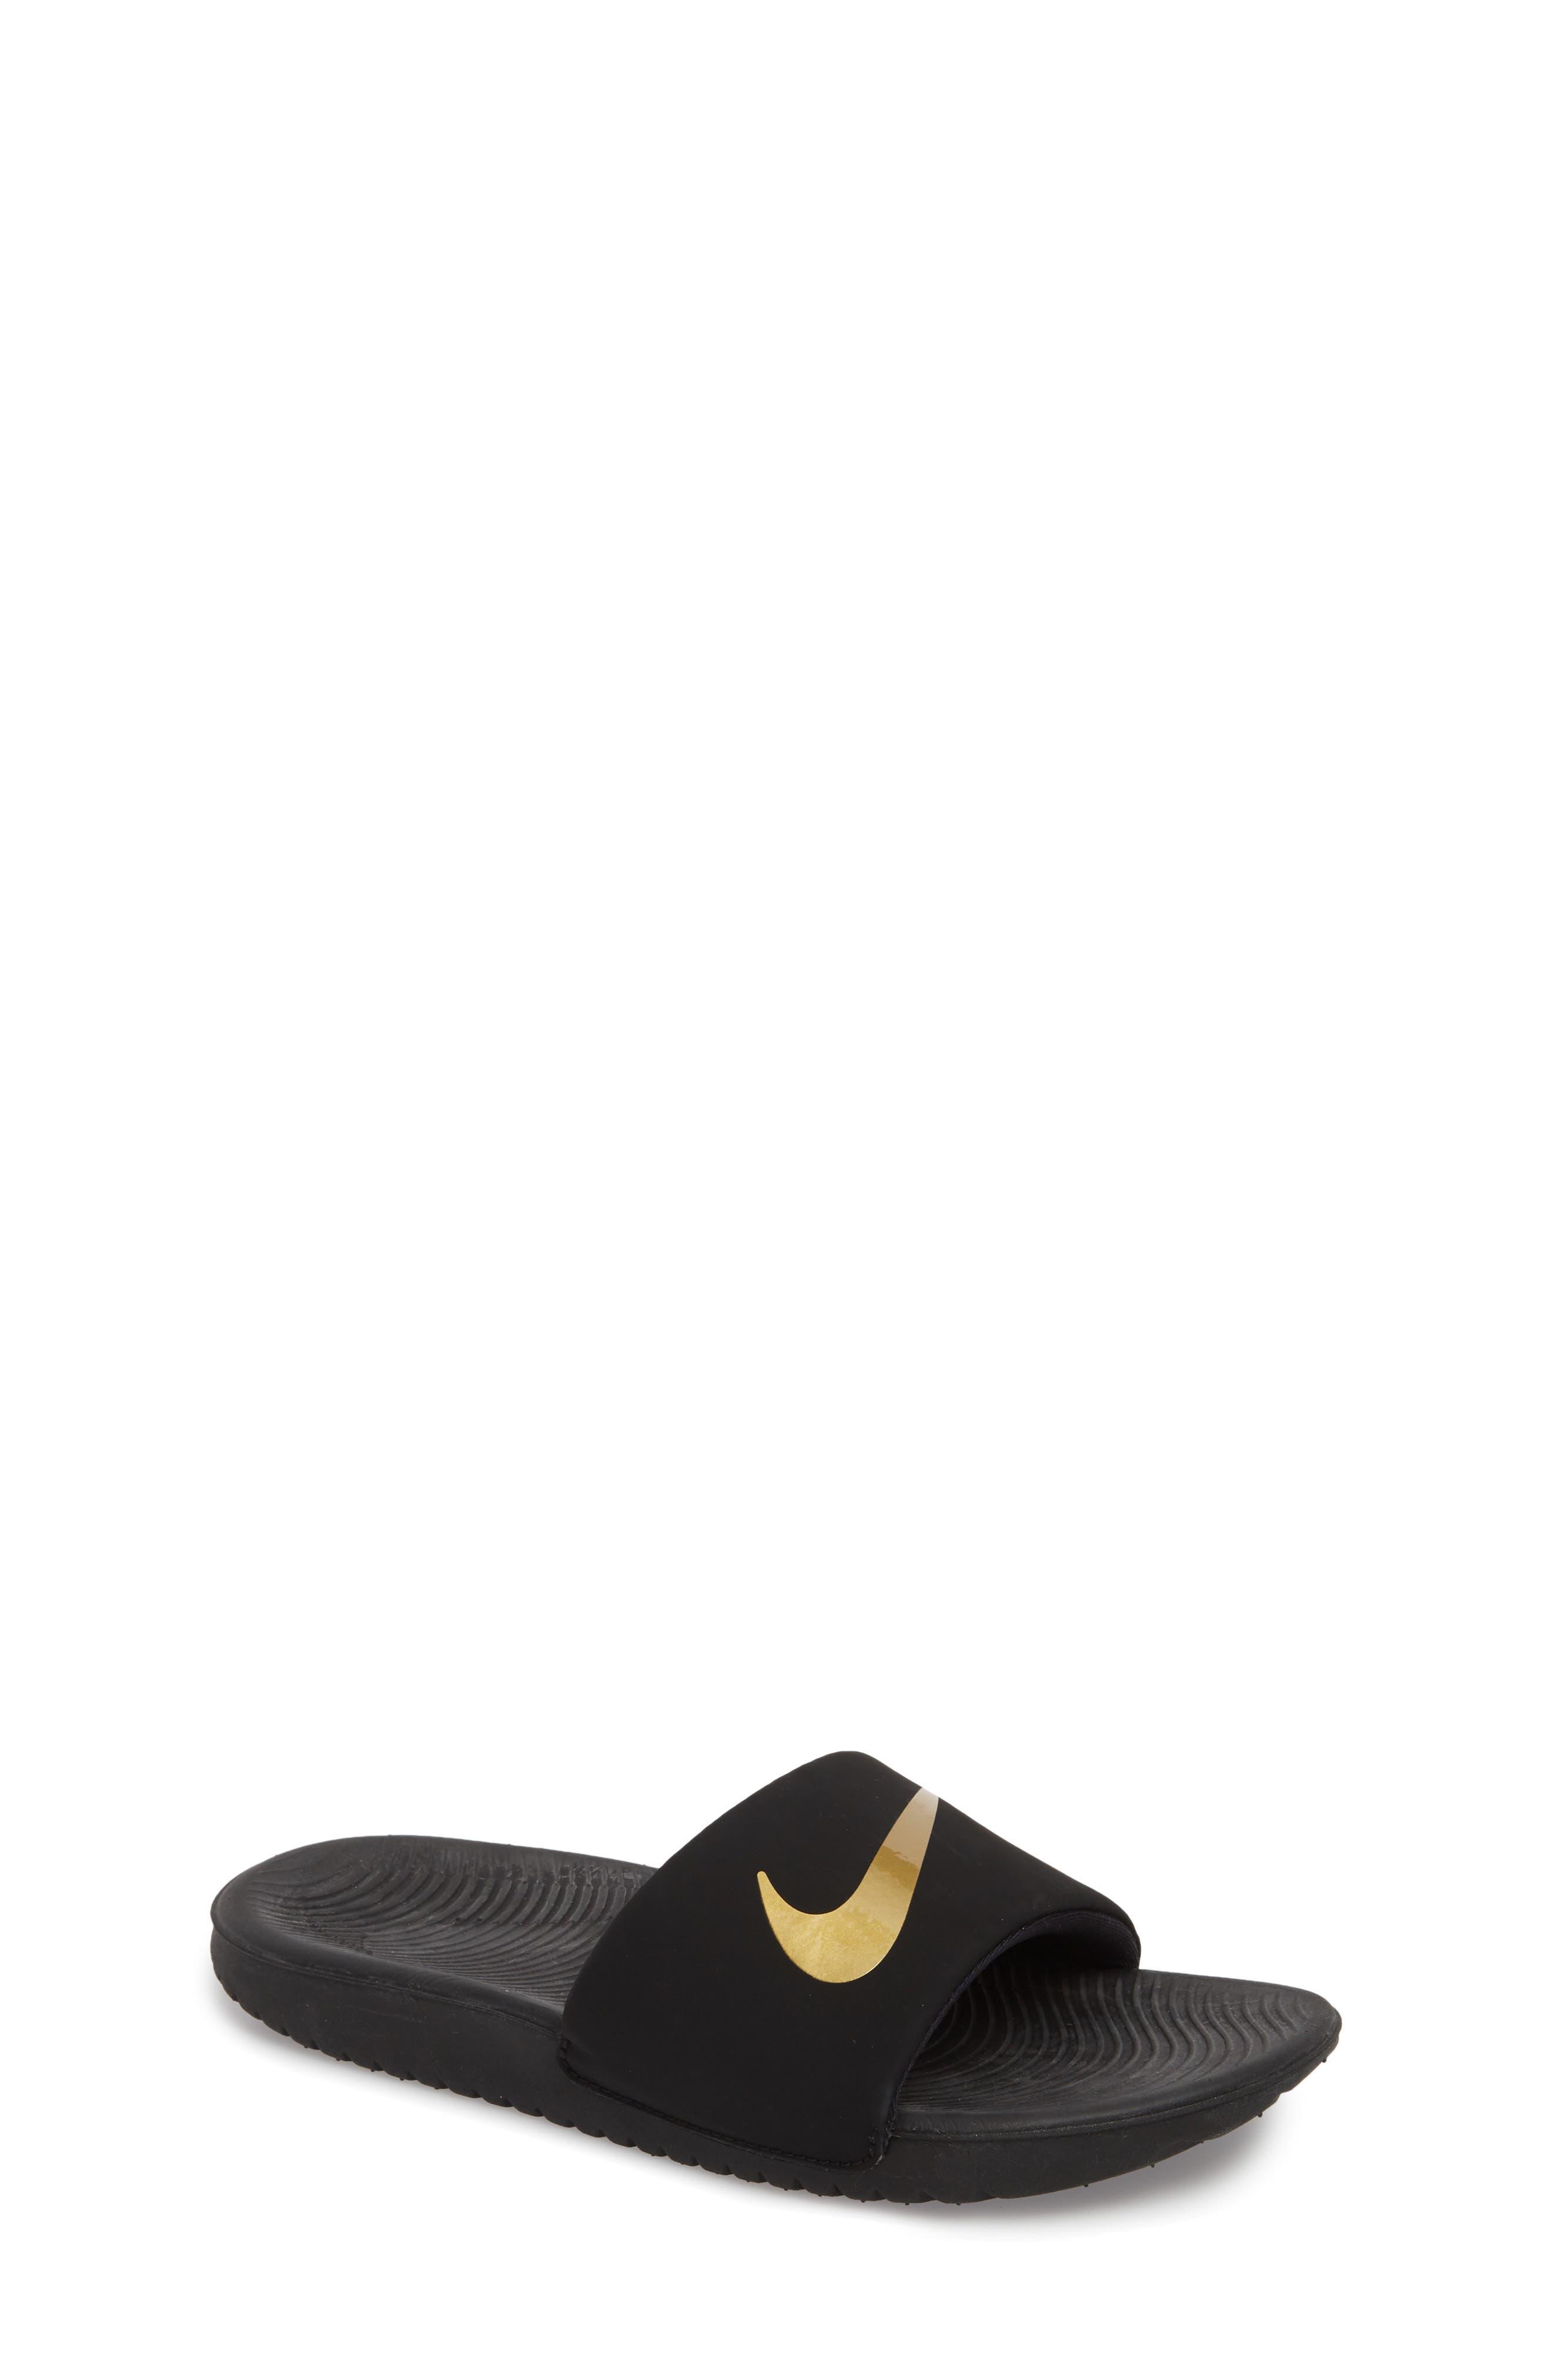 NIKE, 'Kawa' Slide Sandal, Main thumbnail 1, color, BLACK/ METALLIC GOLD